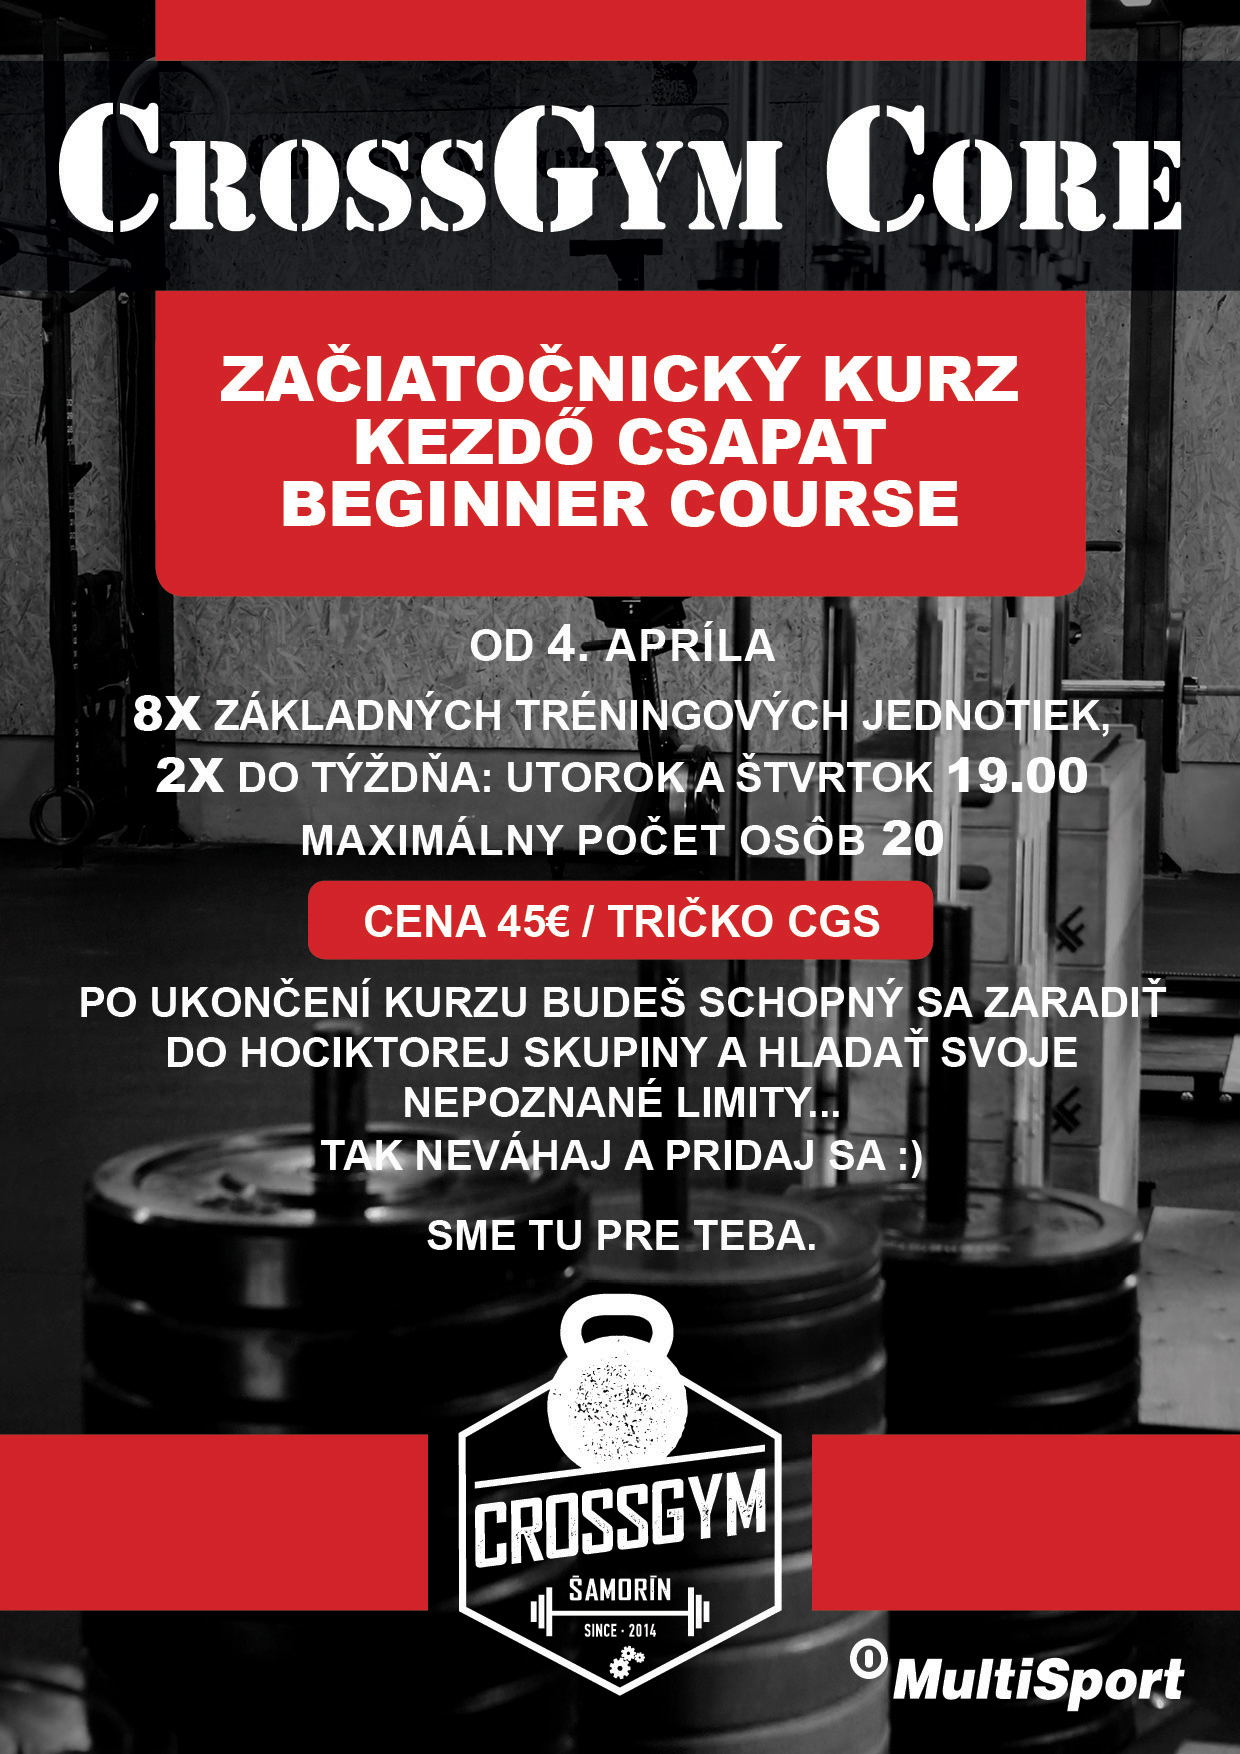 zaciatocnicky-kurz_od_4.-aprila